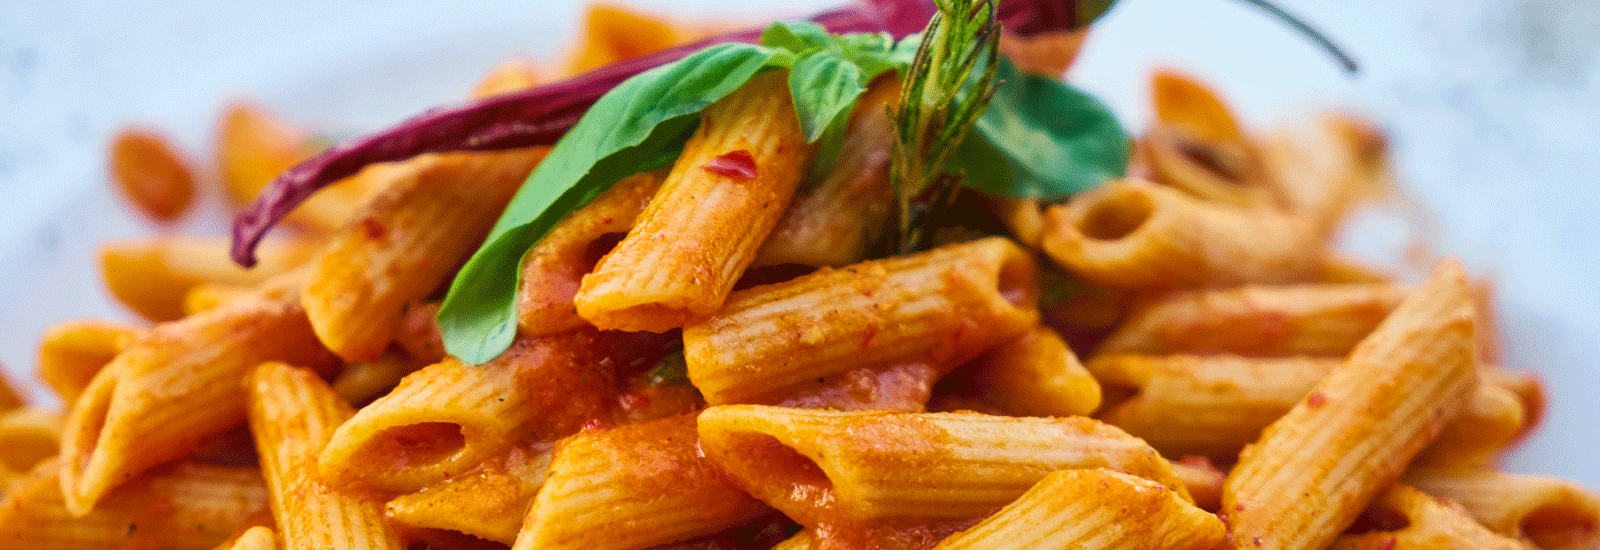 Italian Restaurants Near Fort Belvoir